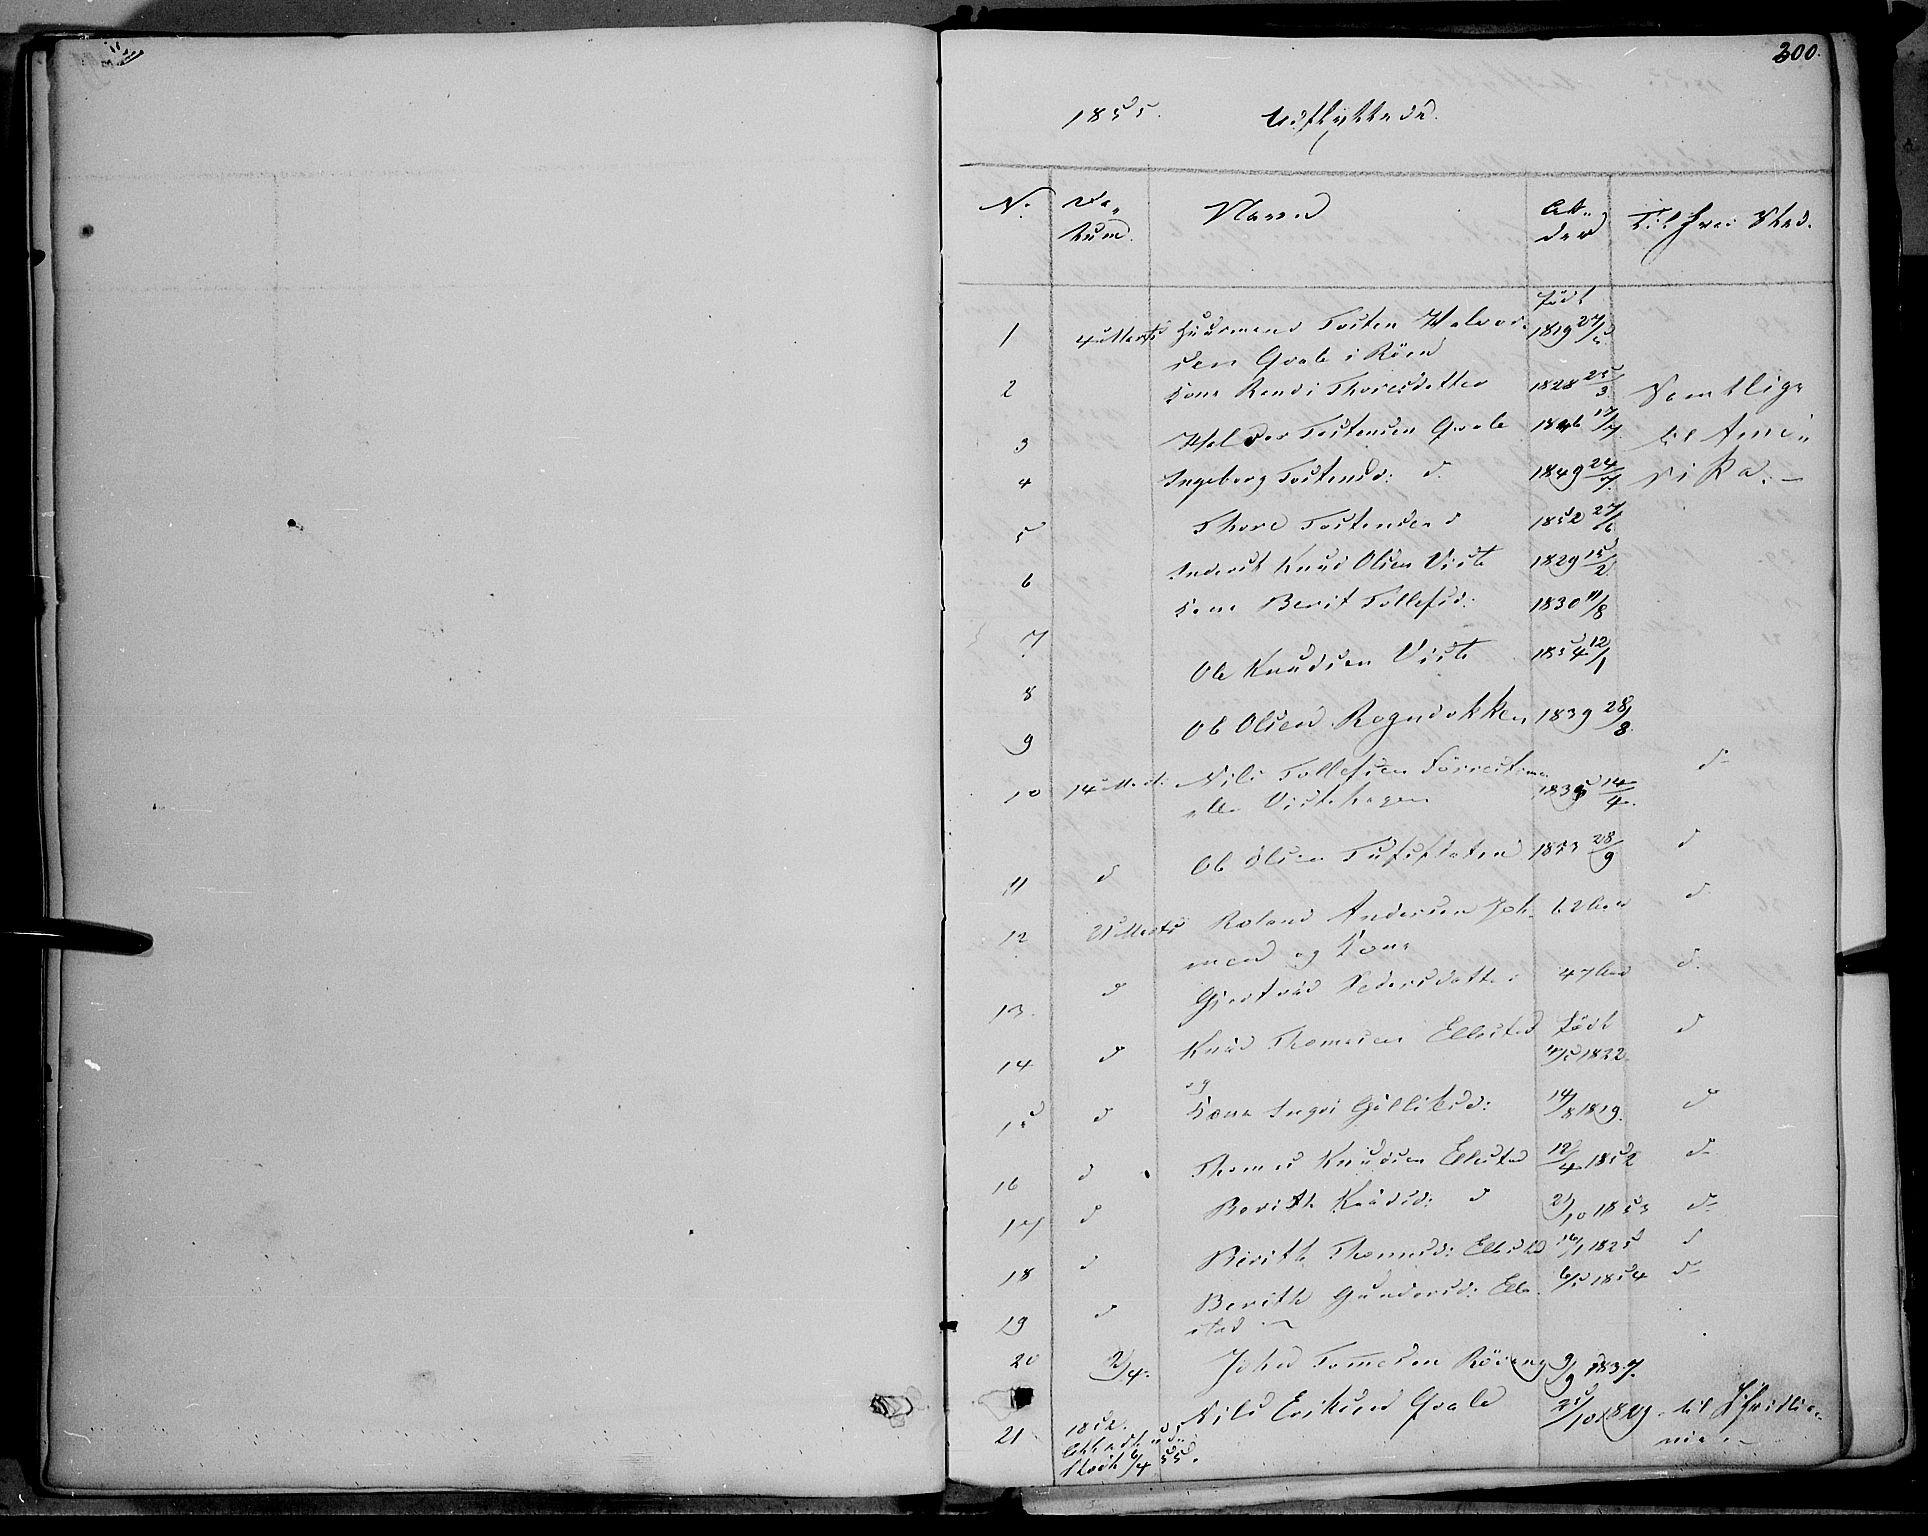 SAH, Vestre Slidre prestekontor, Ministerialbok nr. 1, 1844-1855, s. 300